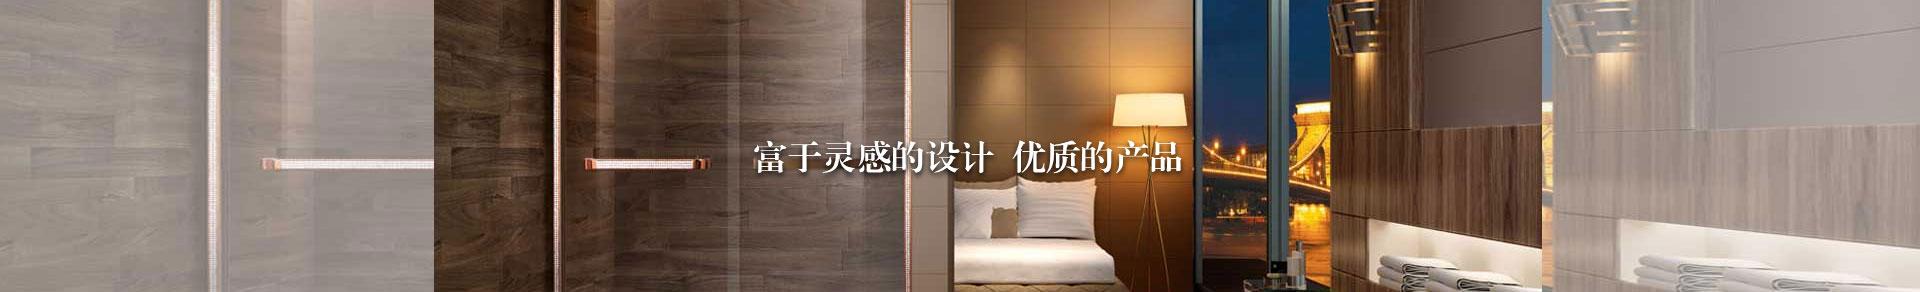 http://www.junlonglunyi.com/data/images/slide/20190701101232_601.jpg